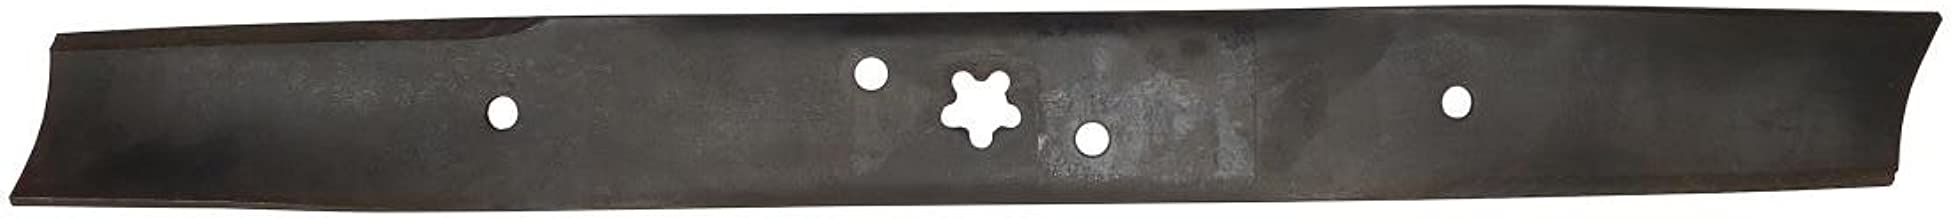 Husqvarna 532421825 Premium Blade Replacement for Lawn Mowers, 22